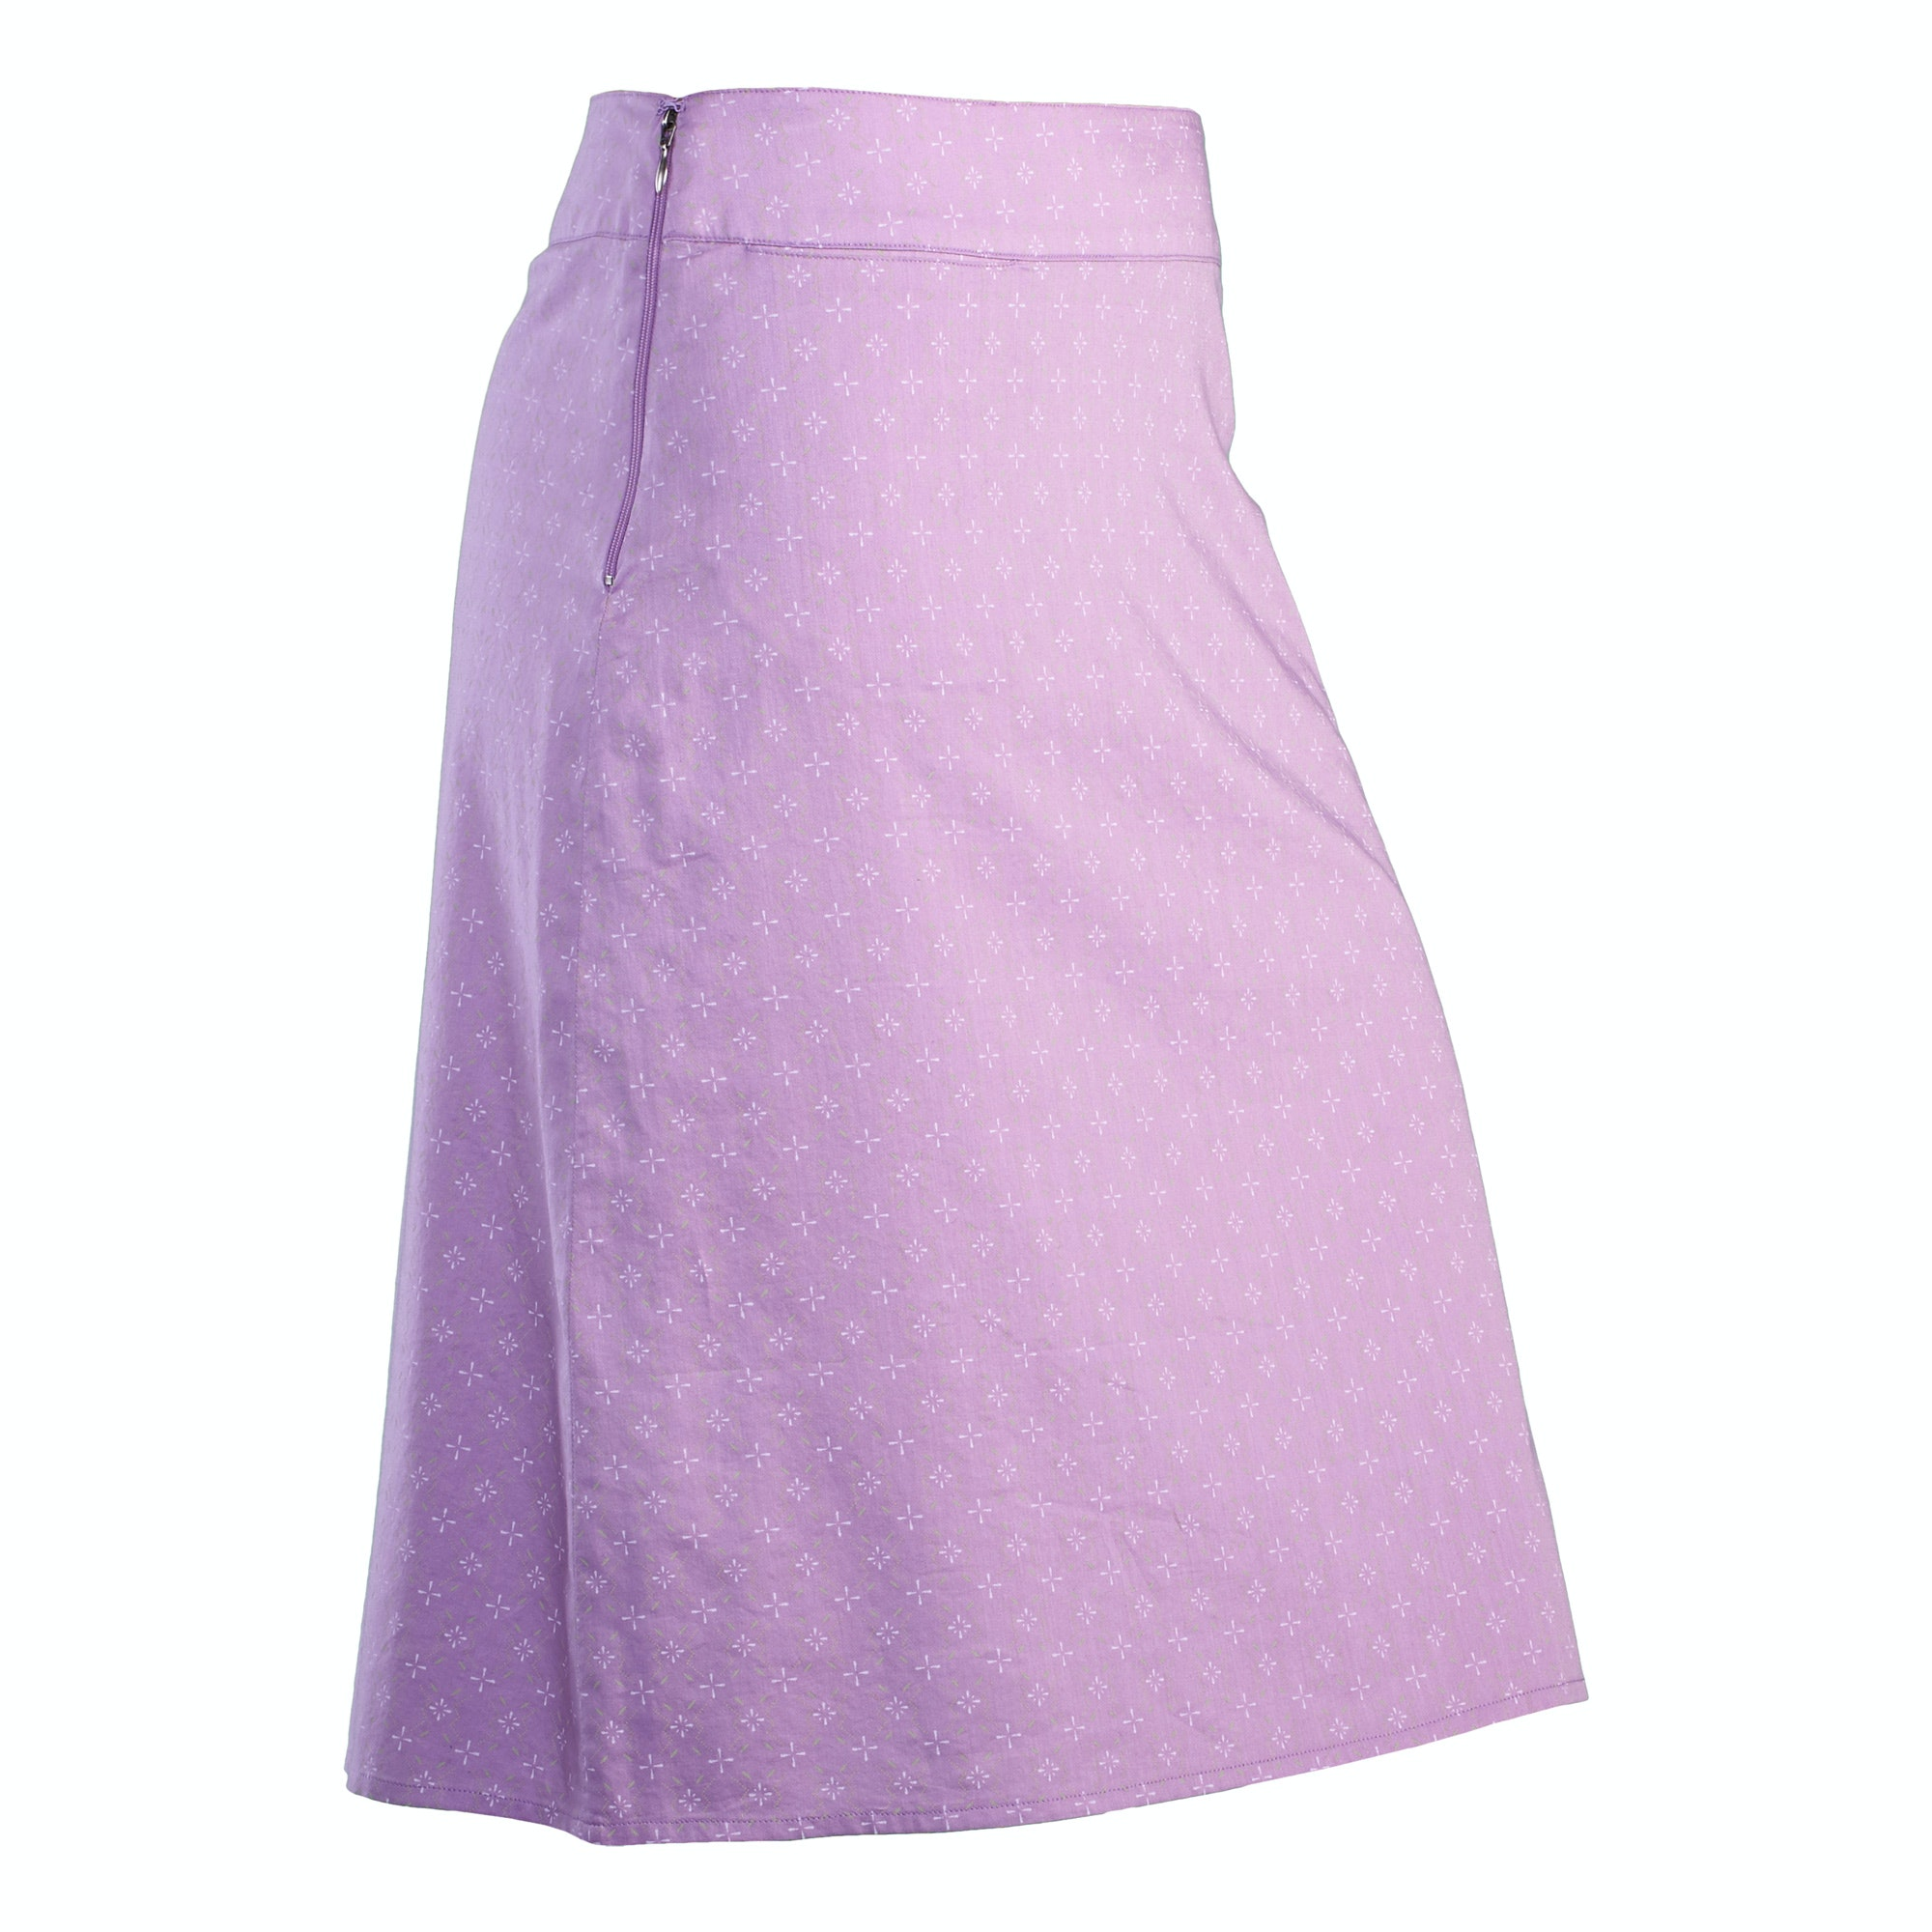 Avignon Women's A-Line Skirt v4 - Lilac Print/Silver Grey